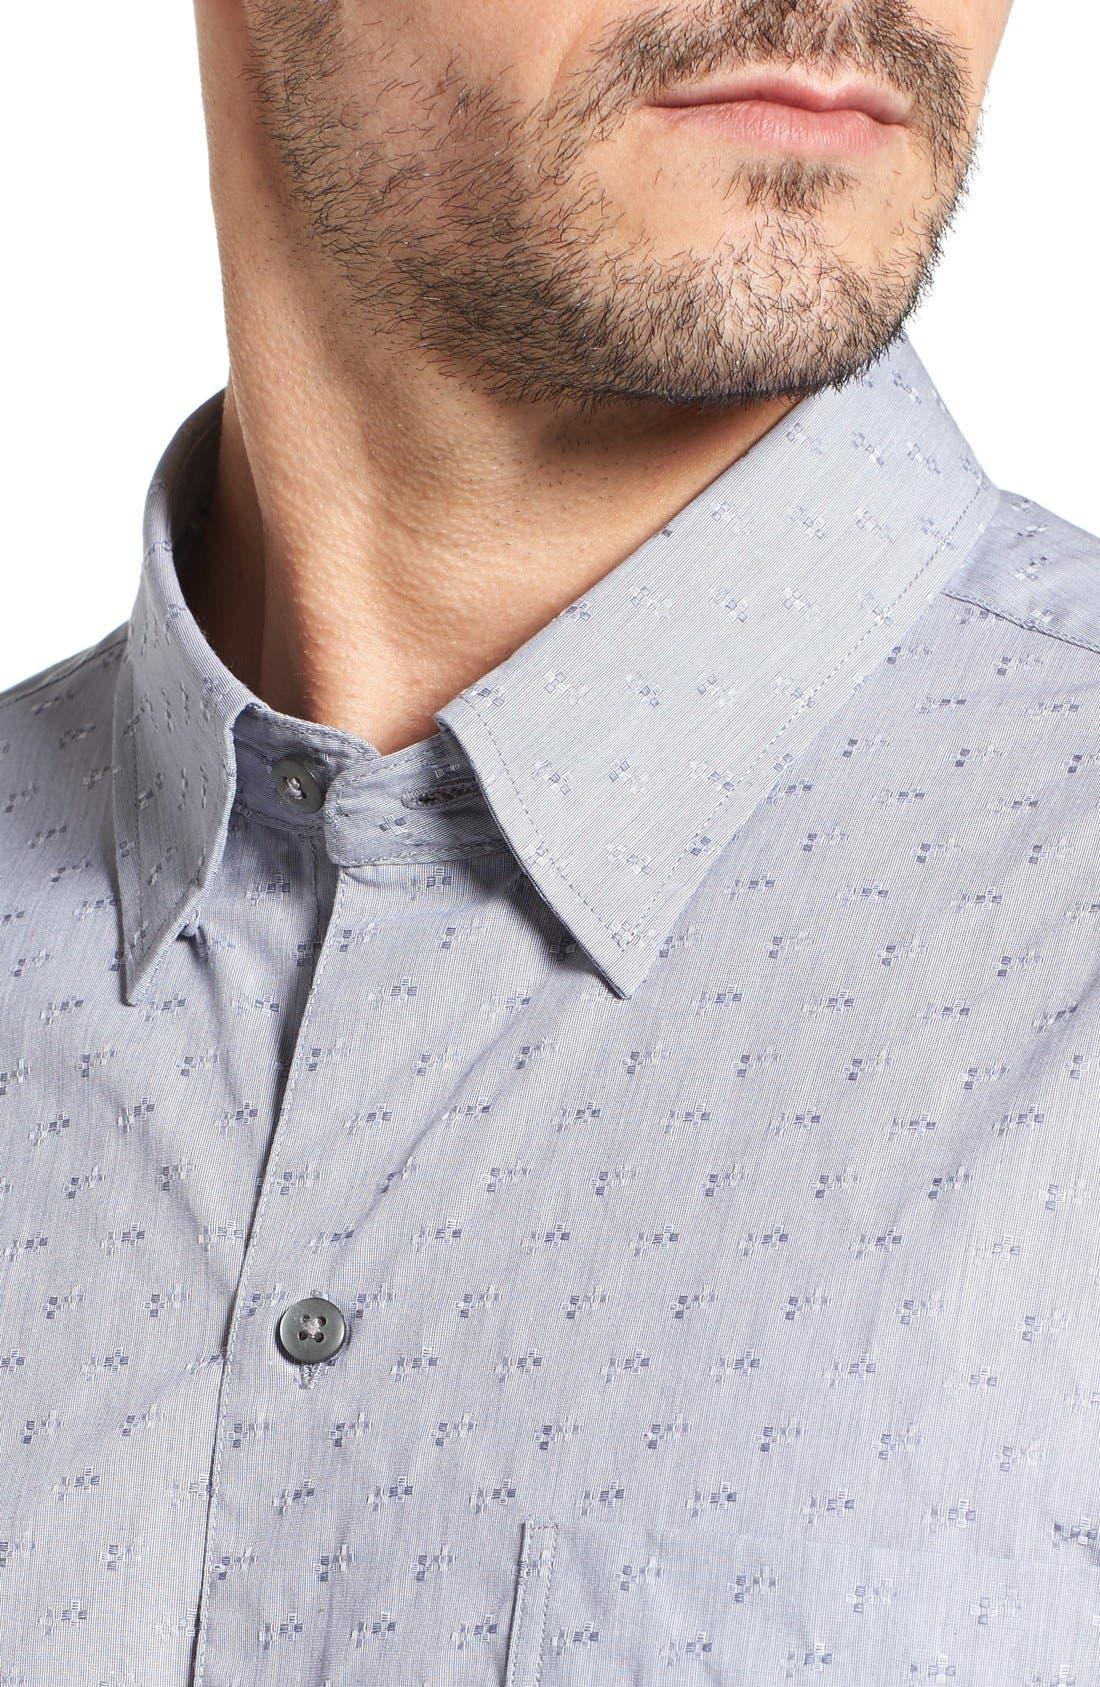 Starboard Jacquard Sport Shirt,                             Alternate thumbnail 2, color,                             Grey/ Multi